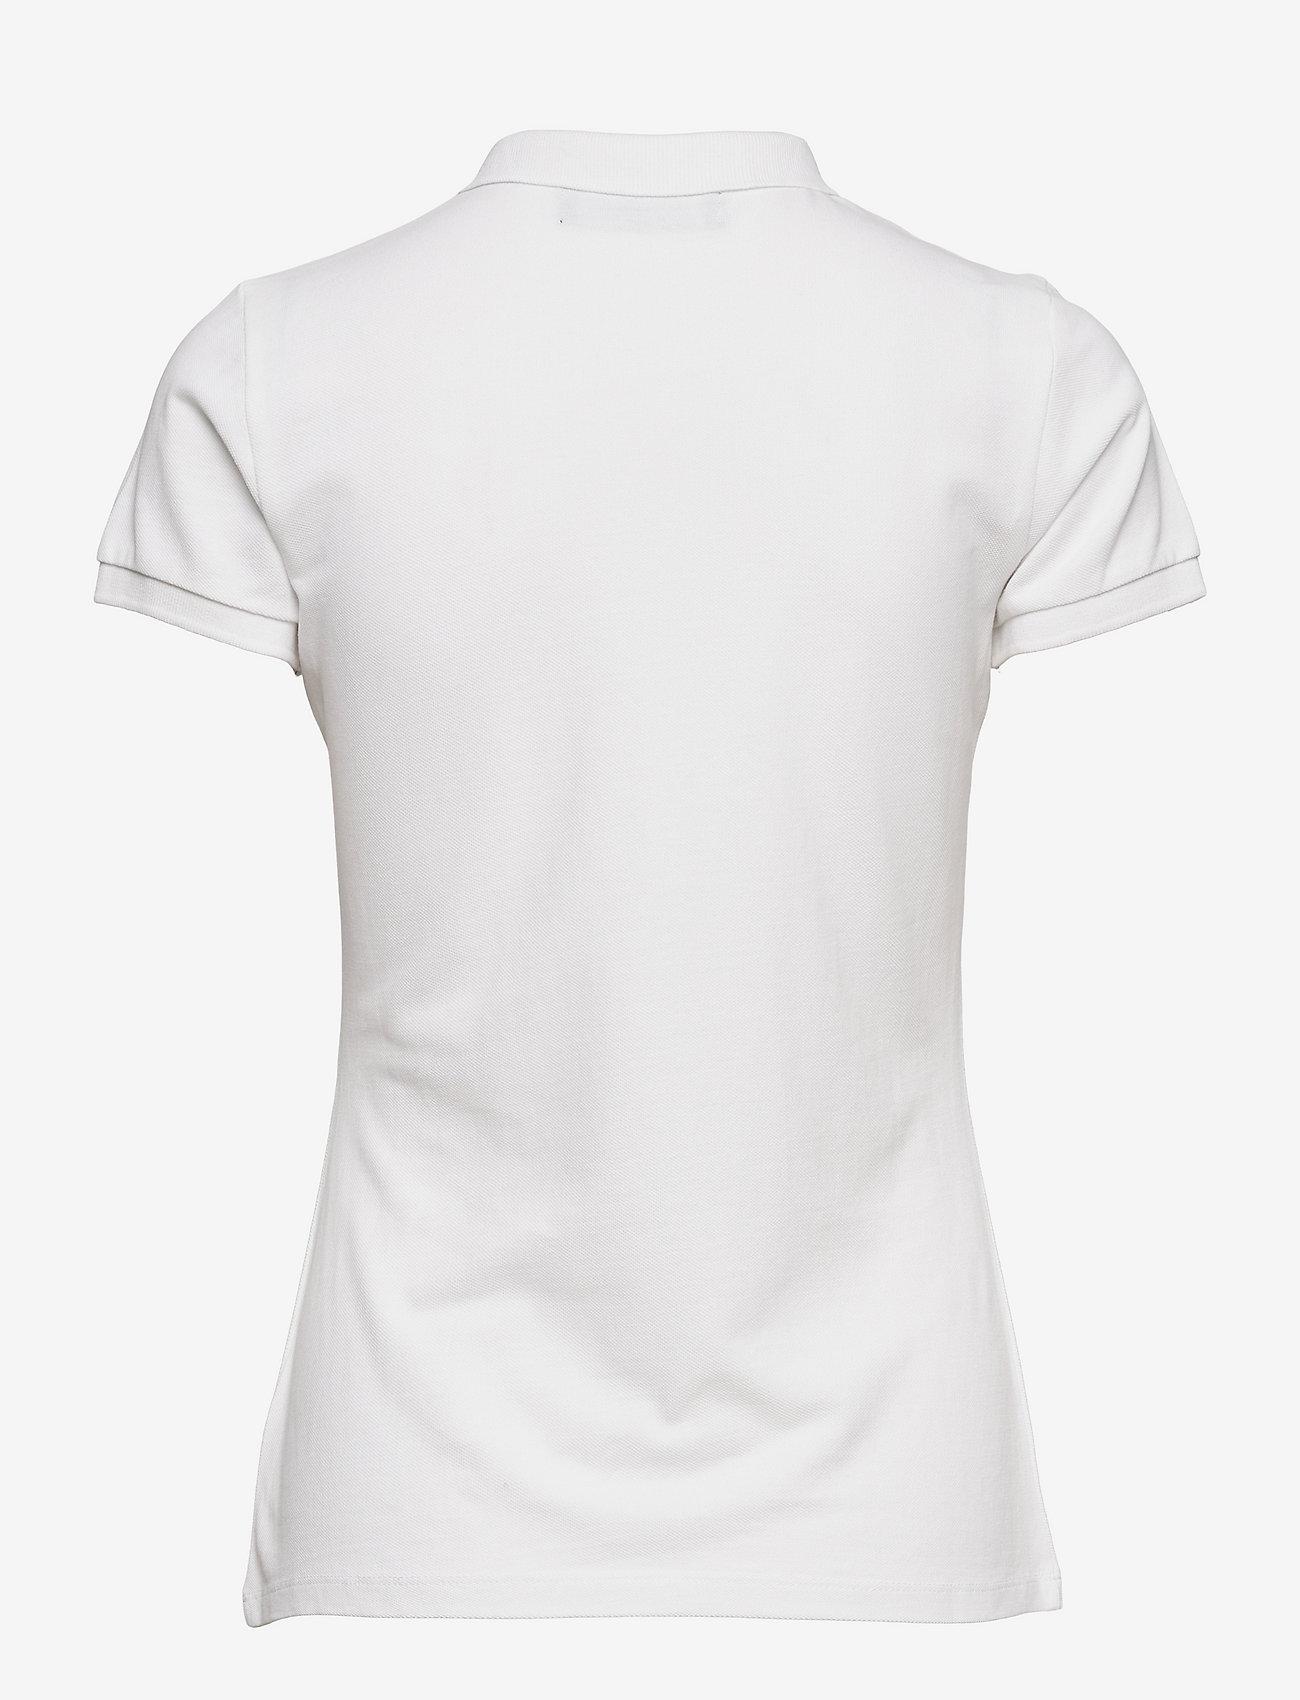 Superdry - POLO SHIRT - polo shirts - chalk white - 1